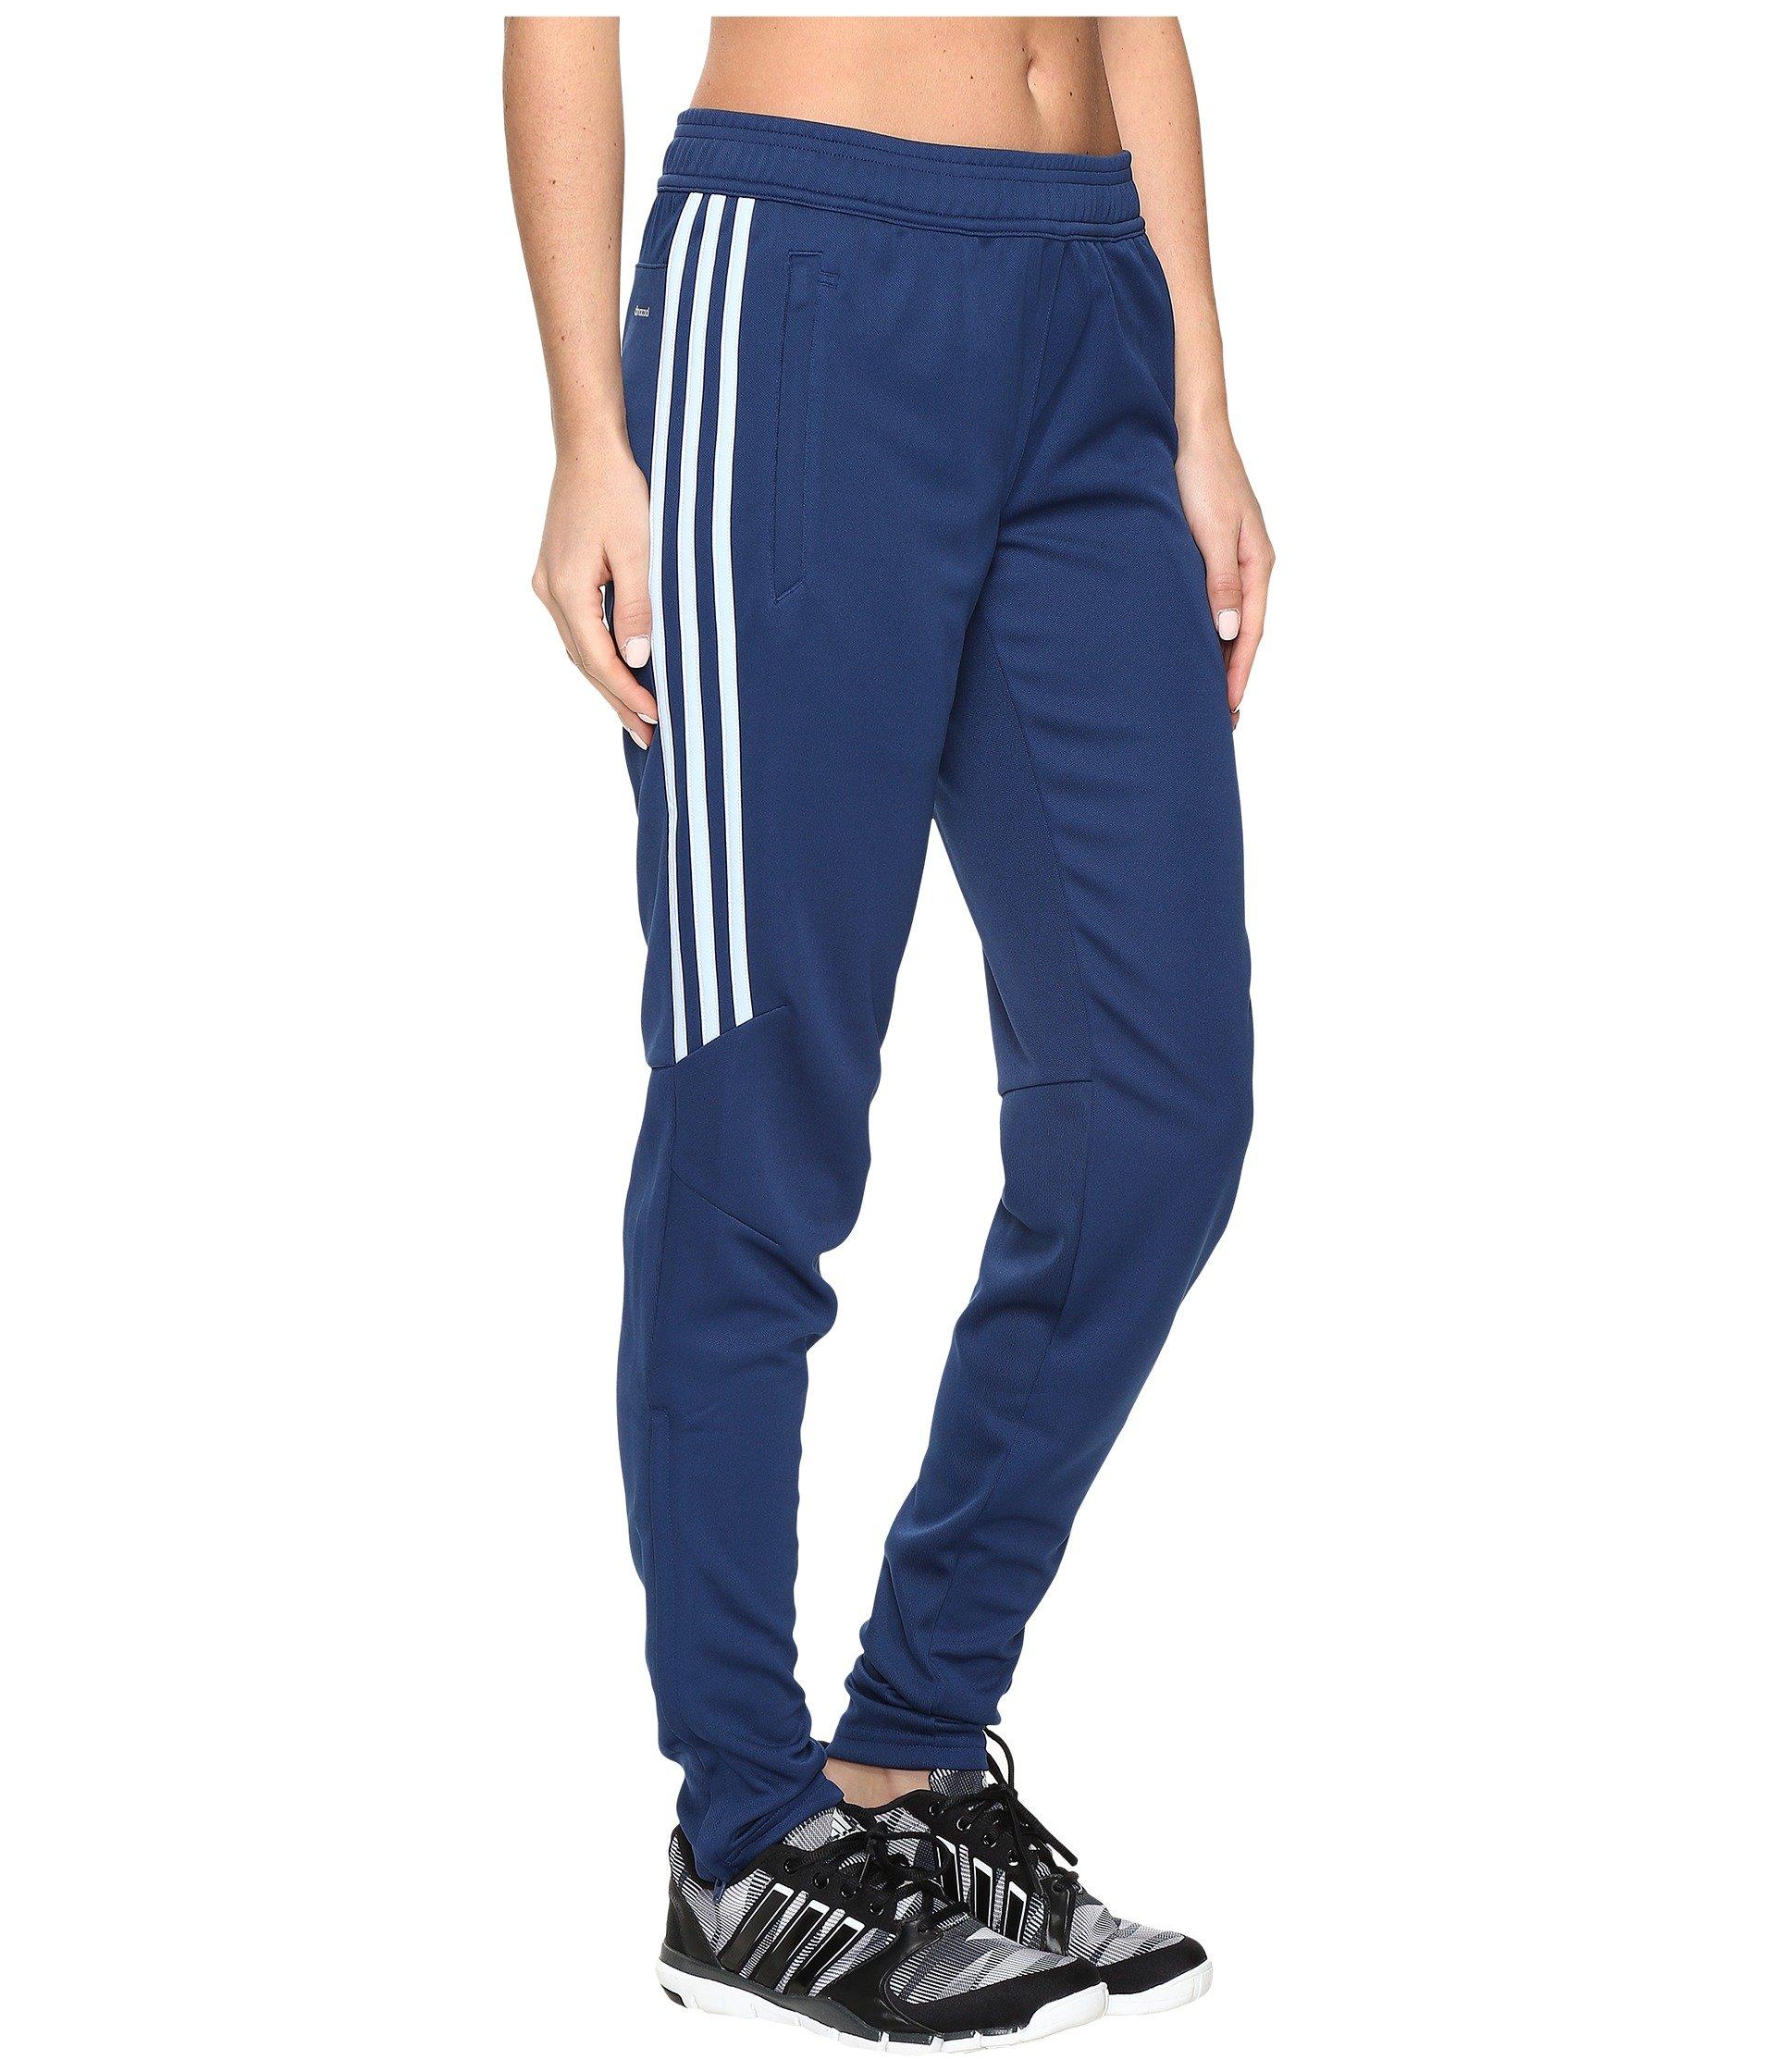 adidas Women's Soccer Tiro 17 Training Pants, Mystery Blue/Easy Blue, X-Large by adidas